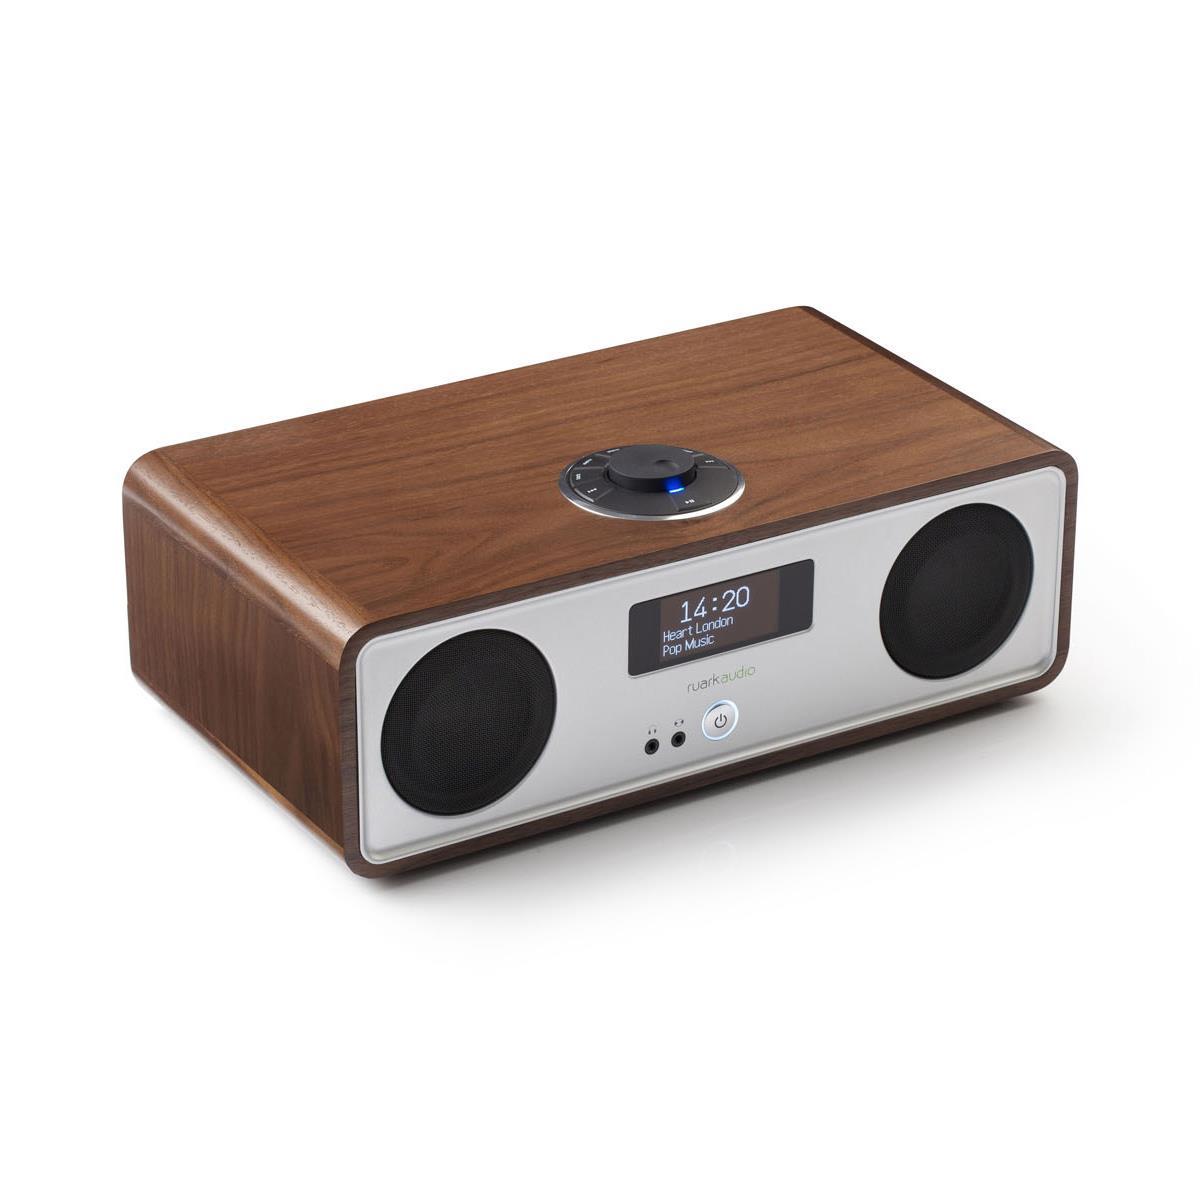 sevenoaks sound and vision ruark audio r2 mk3 wireless speaker system dab fm. Black Bedroom Furniture Sets. Home Design Ideas